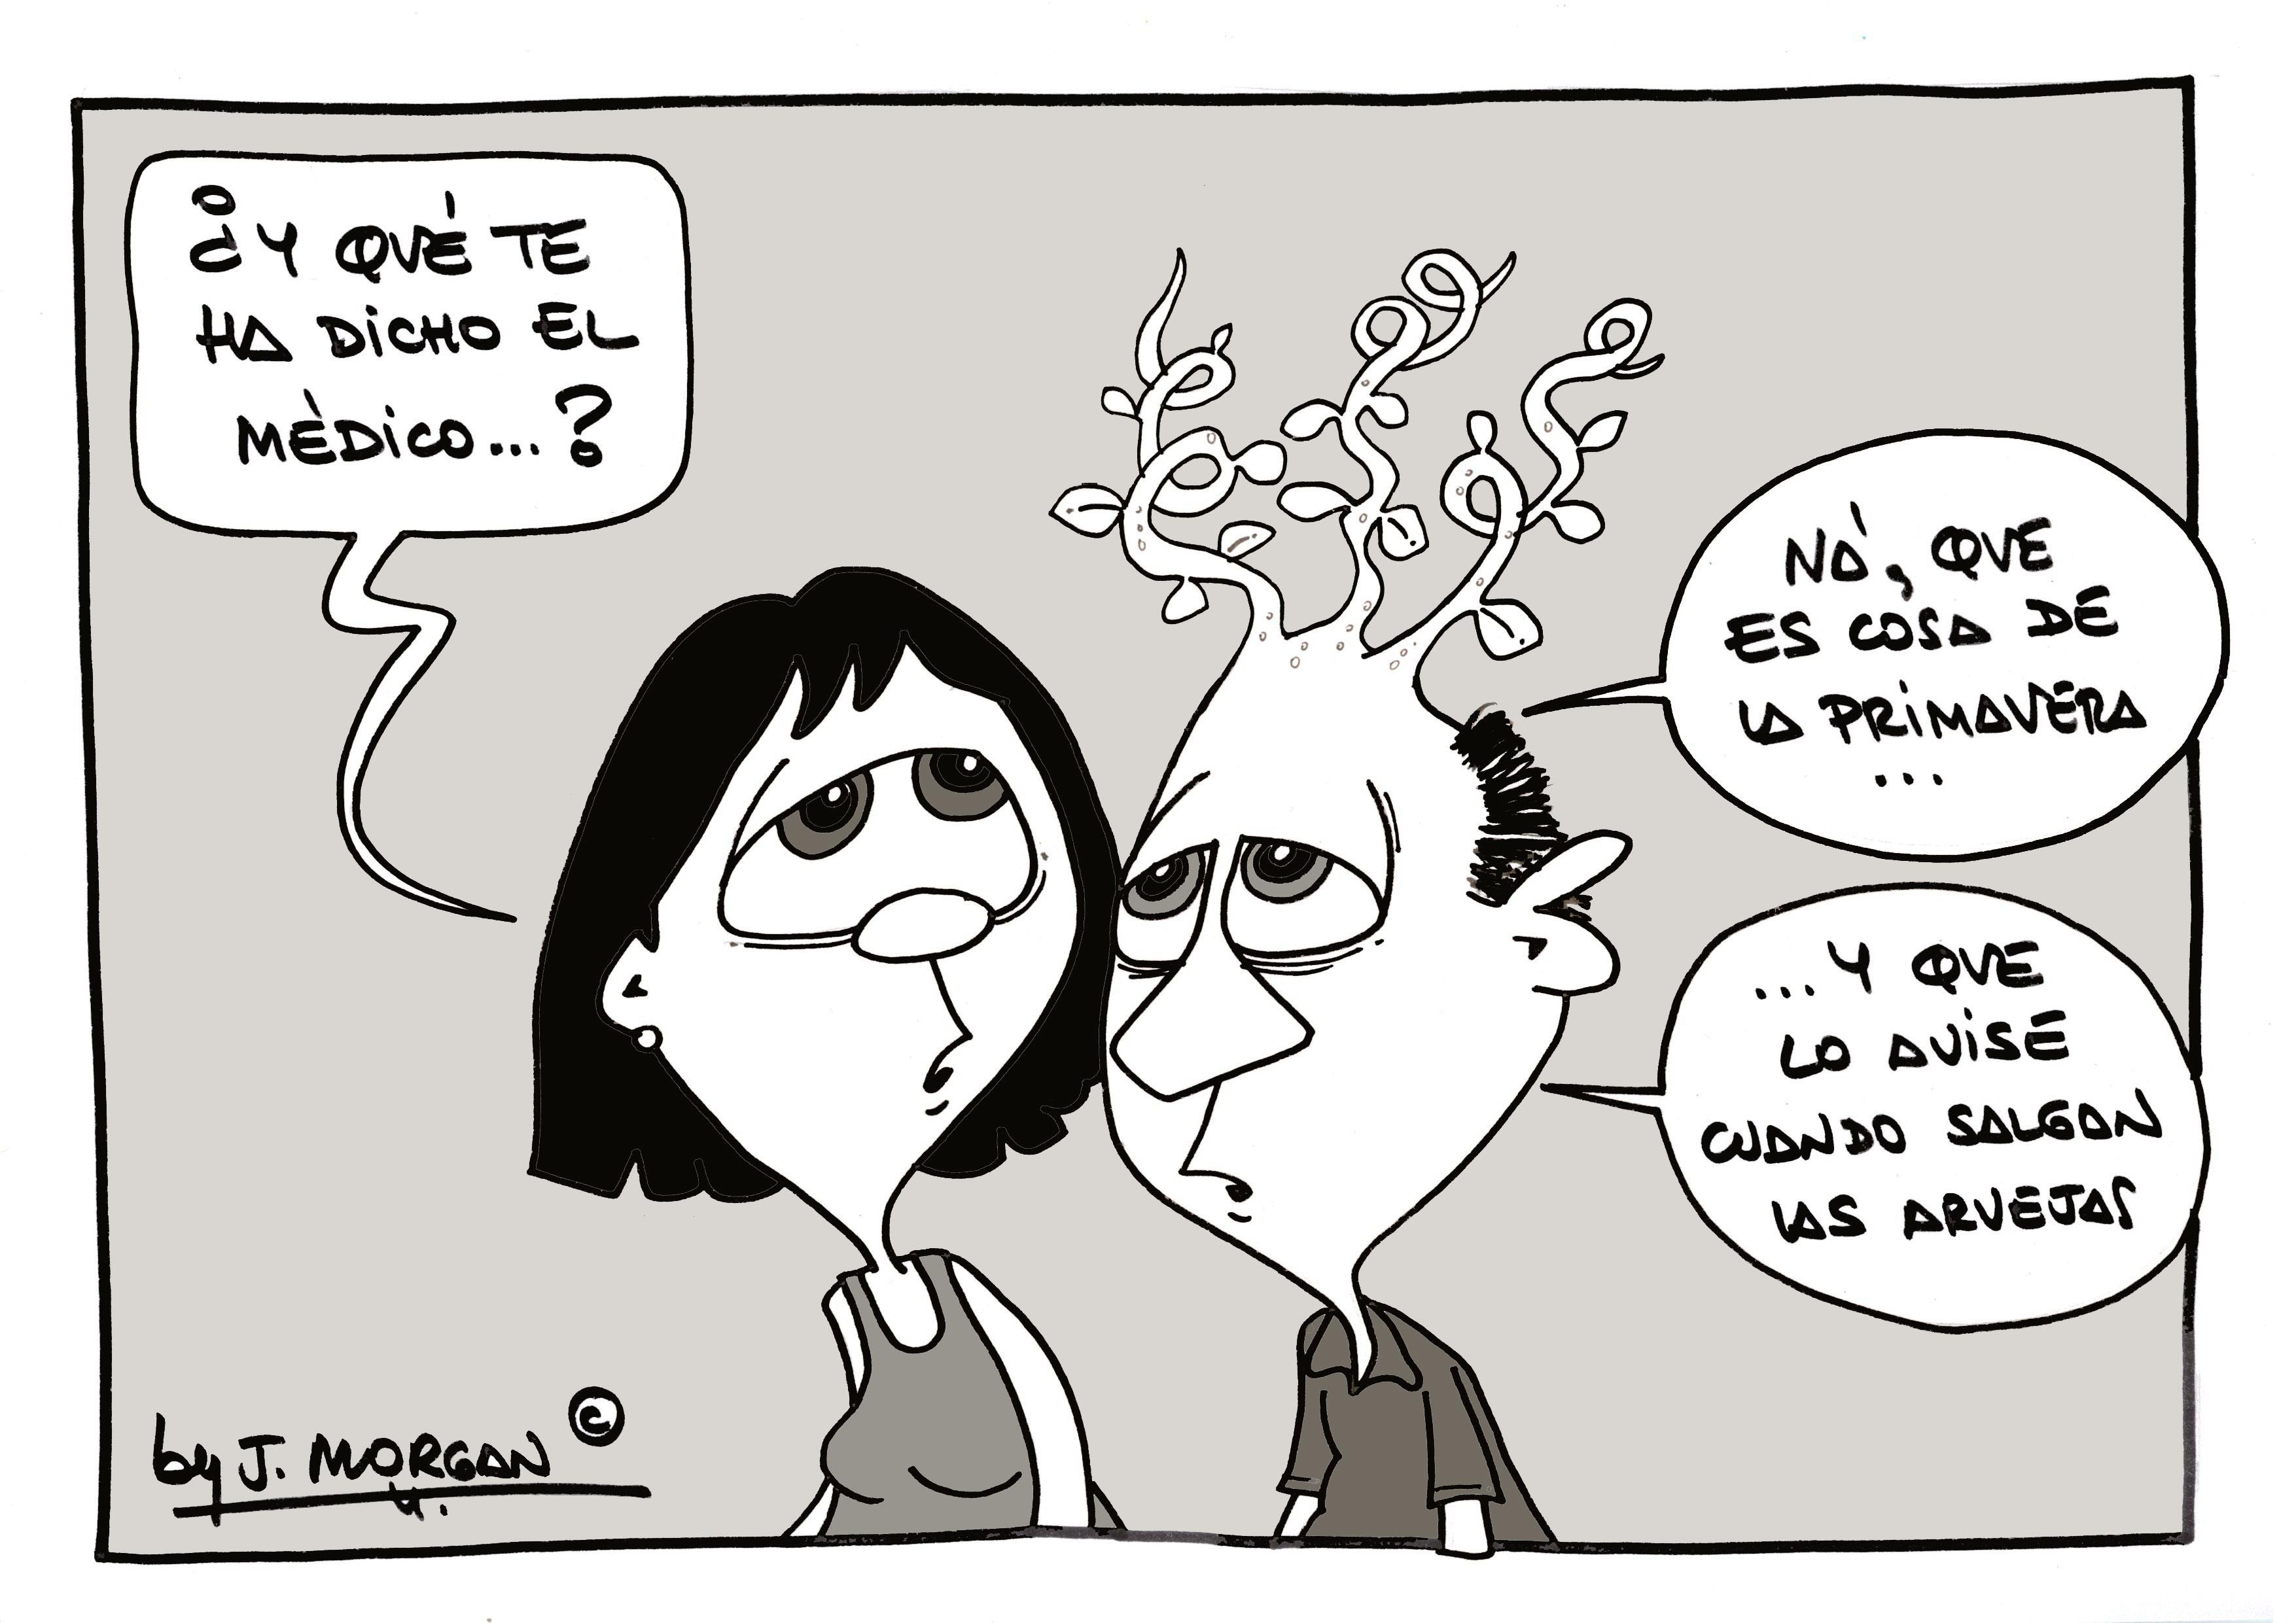 Viñetas de sátira cotidiana